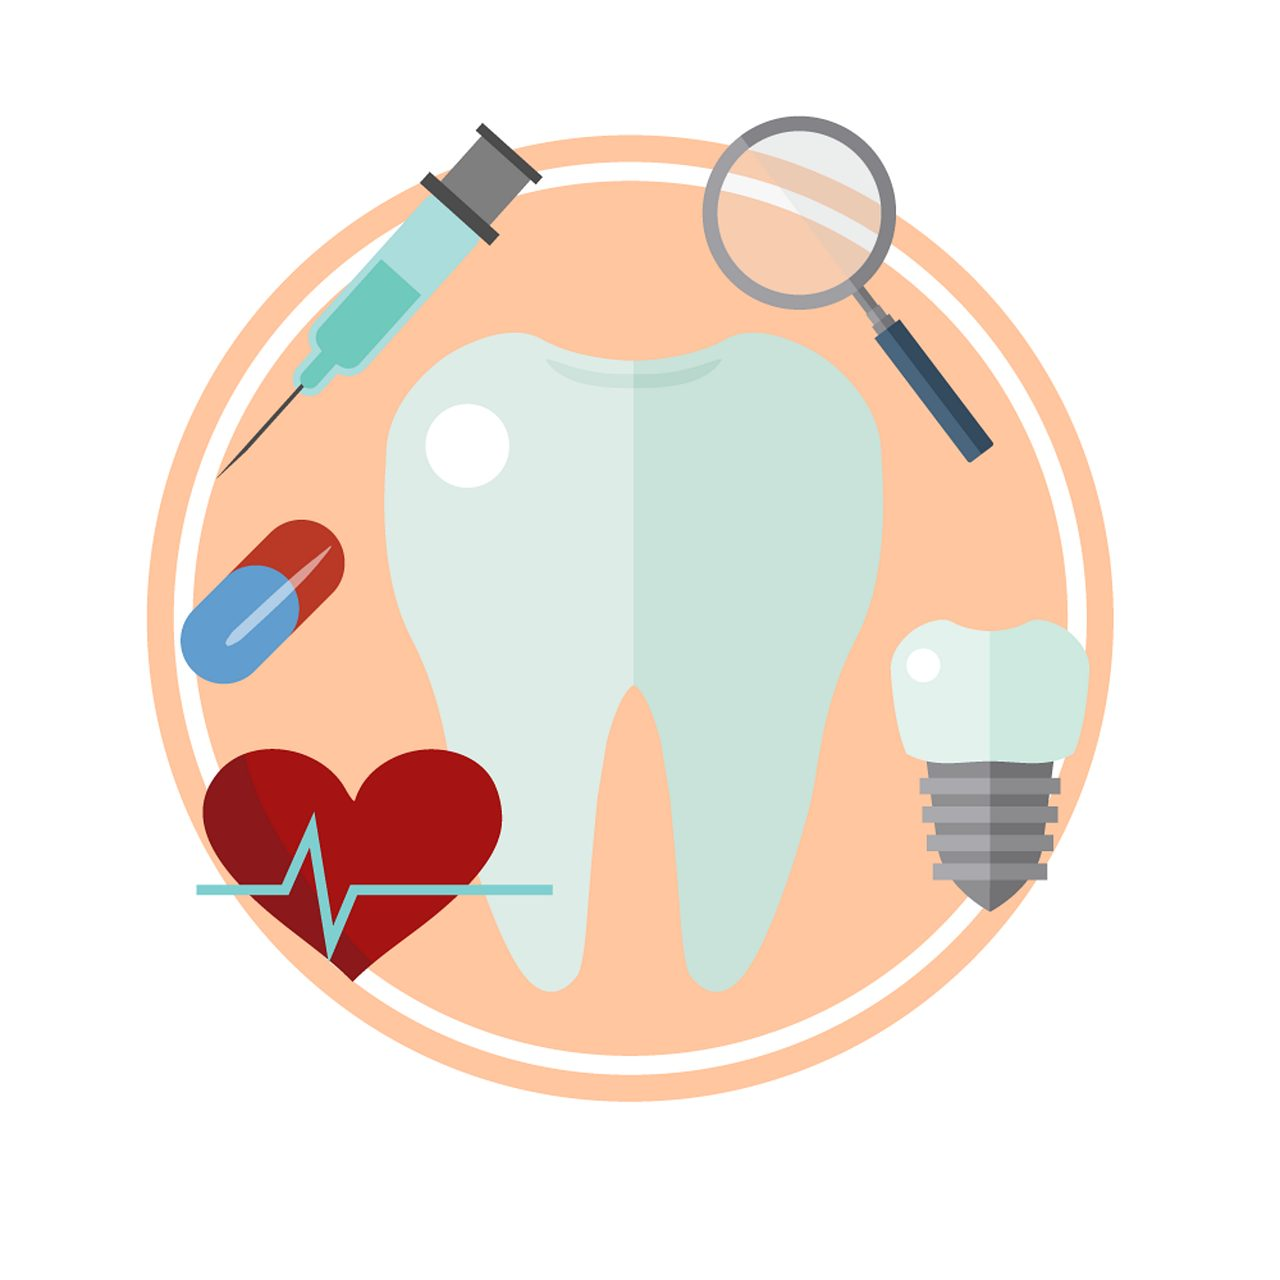 SmileNow - Tanden Bleken tandartsen